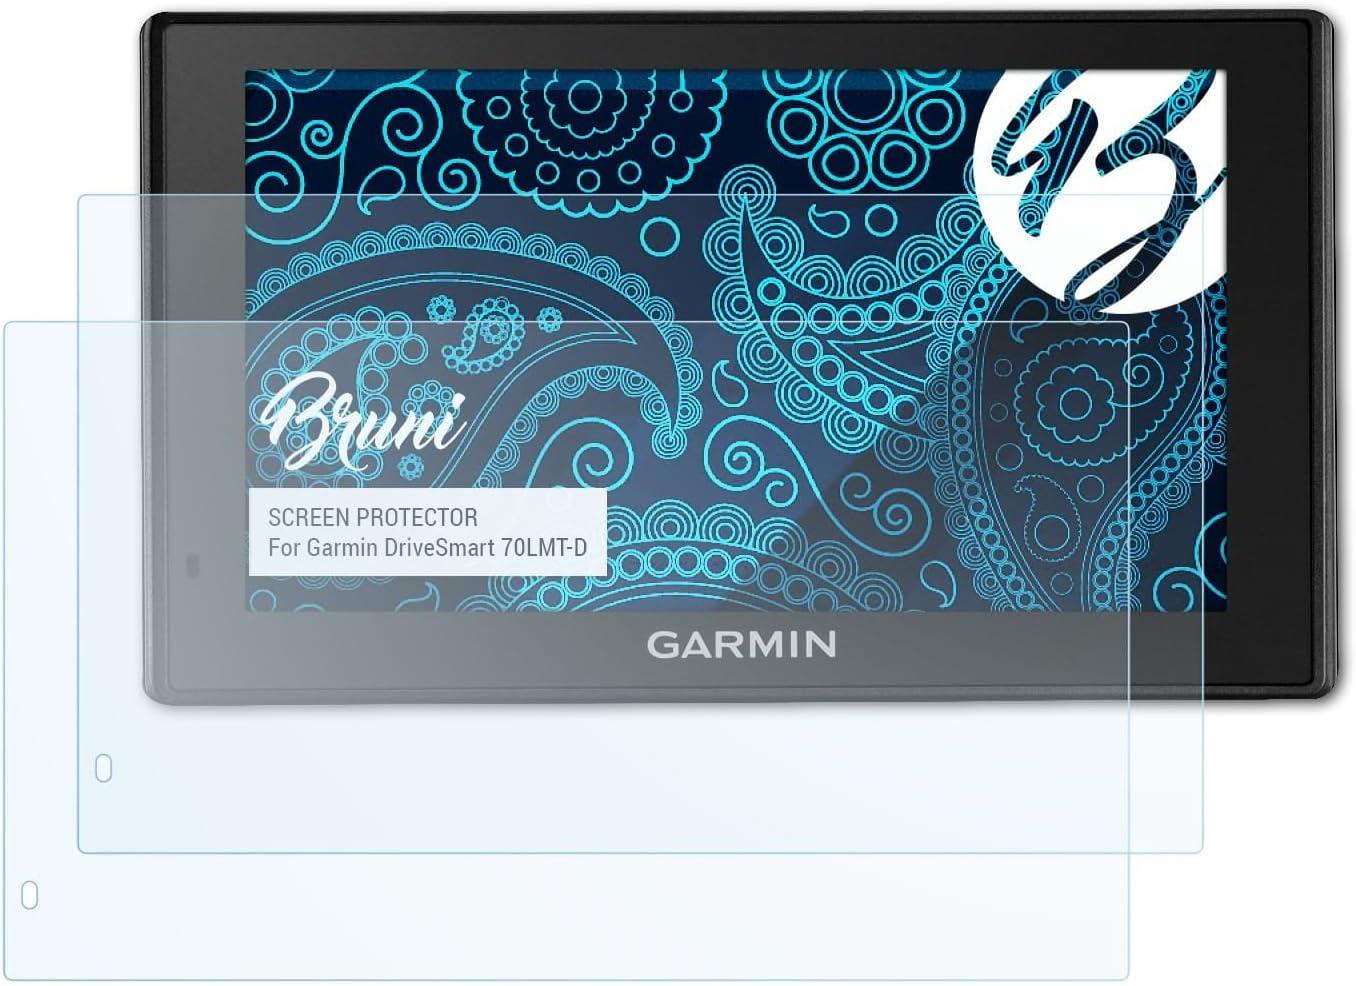 Bruni Película Protectora Compatible con Garmin DriveSmart 70LMT-D Protector Película, Claro Lámina Protectora (2X)